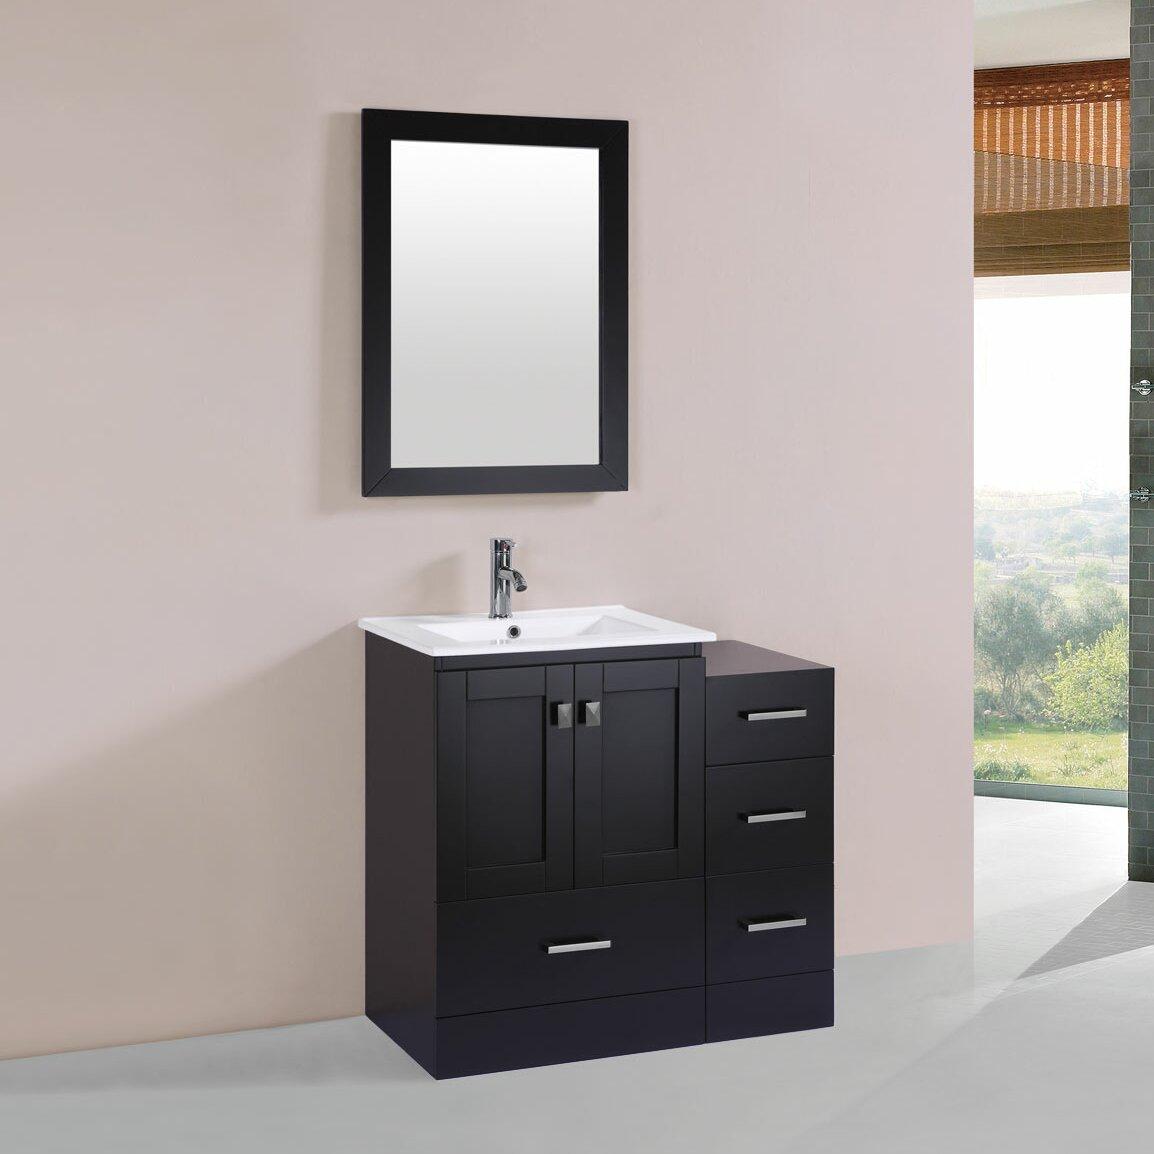 Pacificcollection redondo 36 single modern bathroom side for Bathroom side mirror